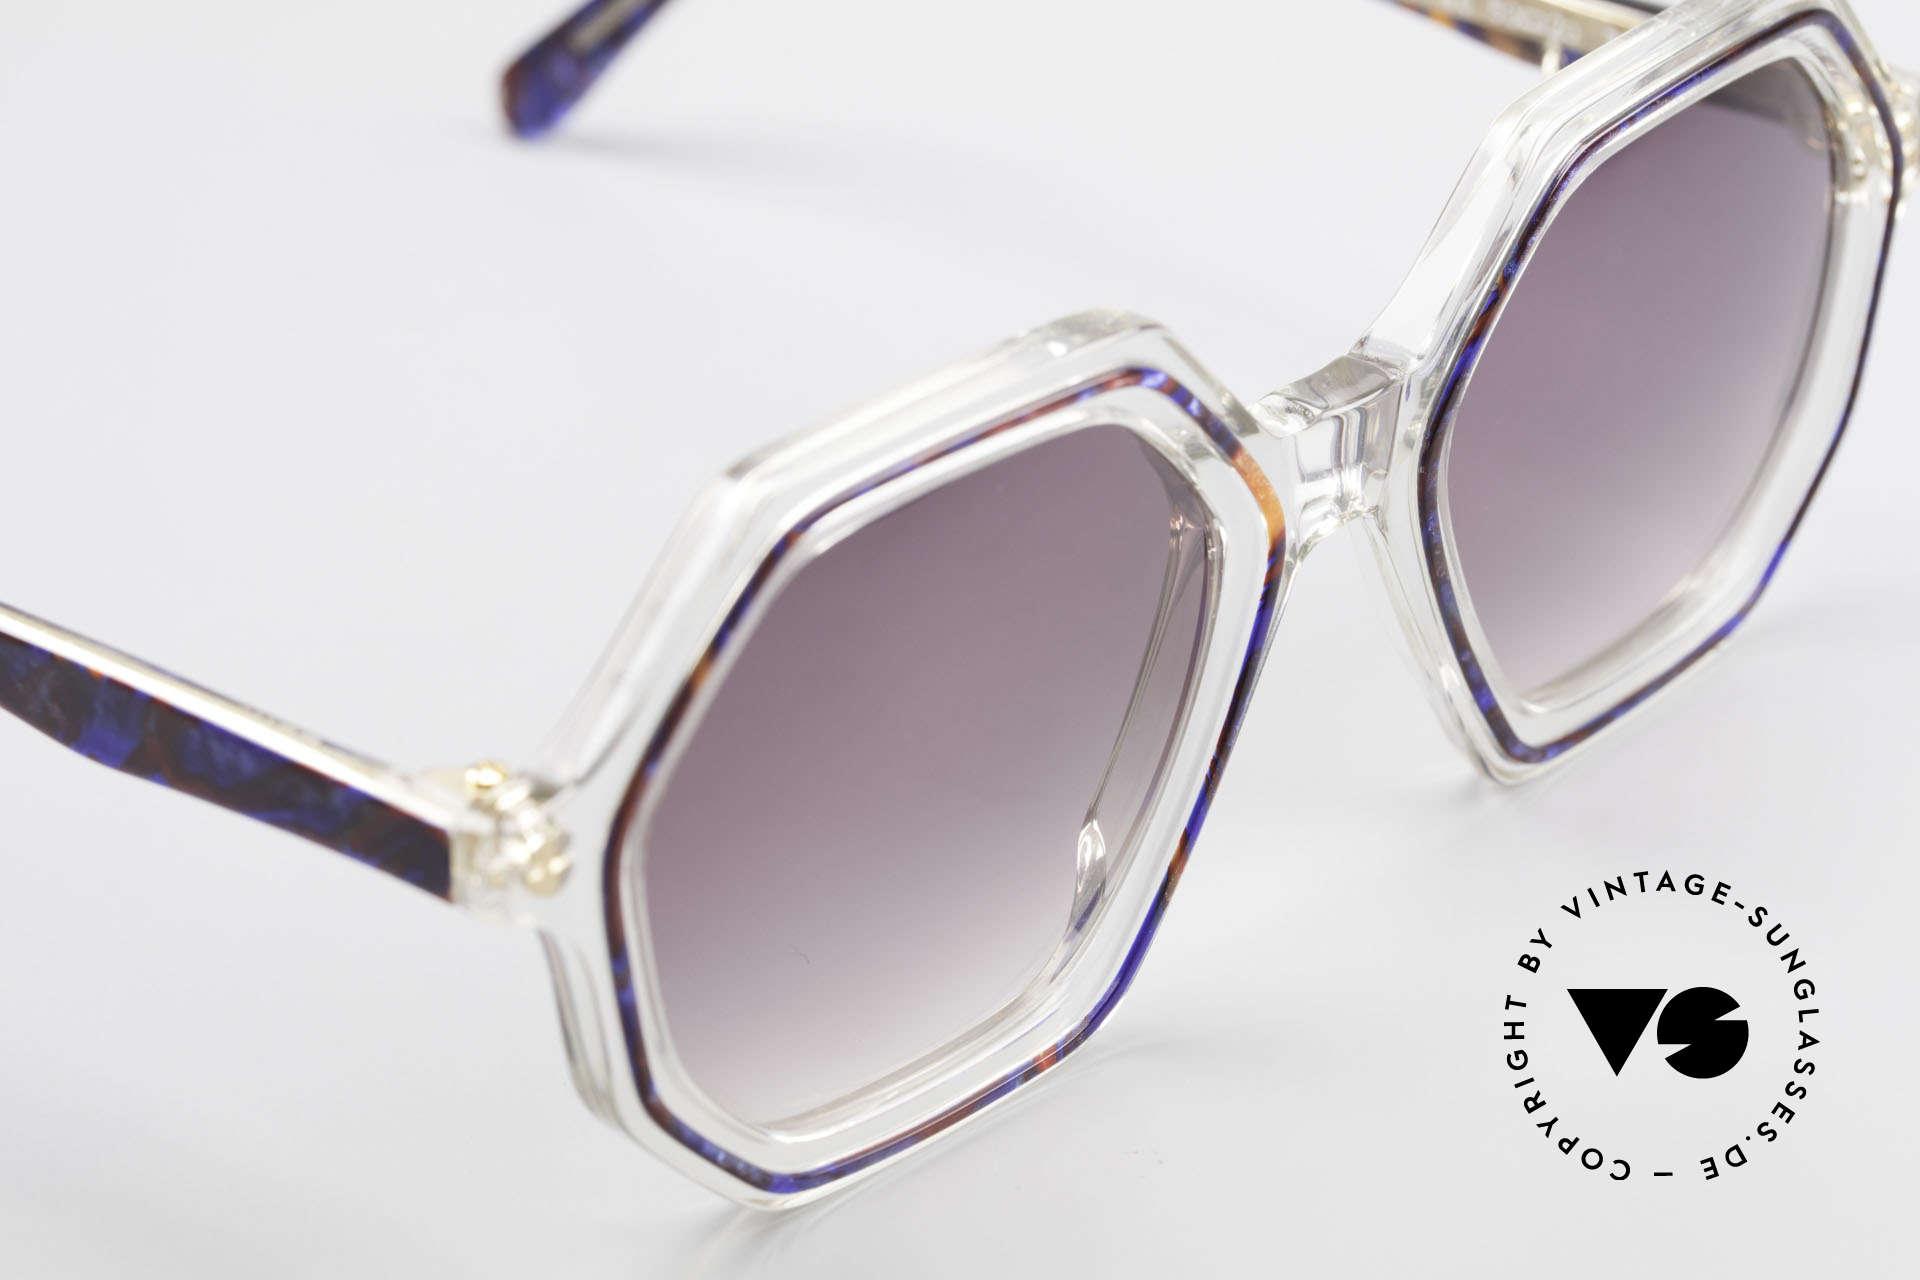 Sonia Rykiel SR46 756 Octagonal 70's Sunglasses, NO RETRO fashion, but a genuine 40 years old unicum, Made for Women